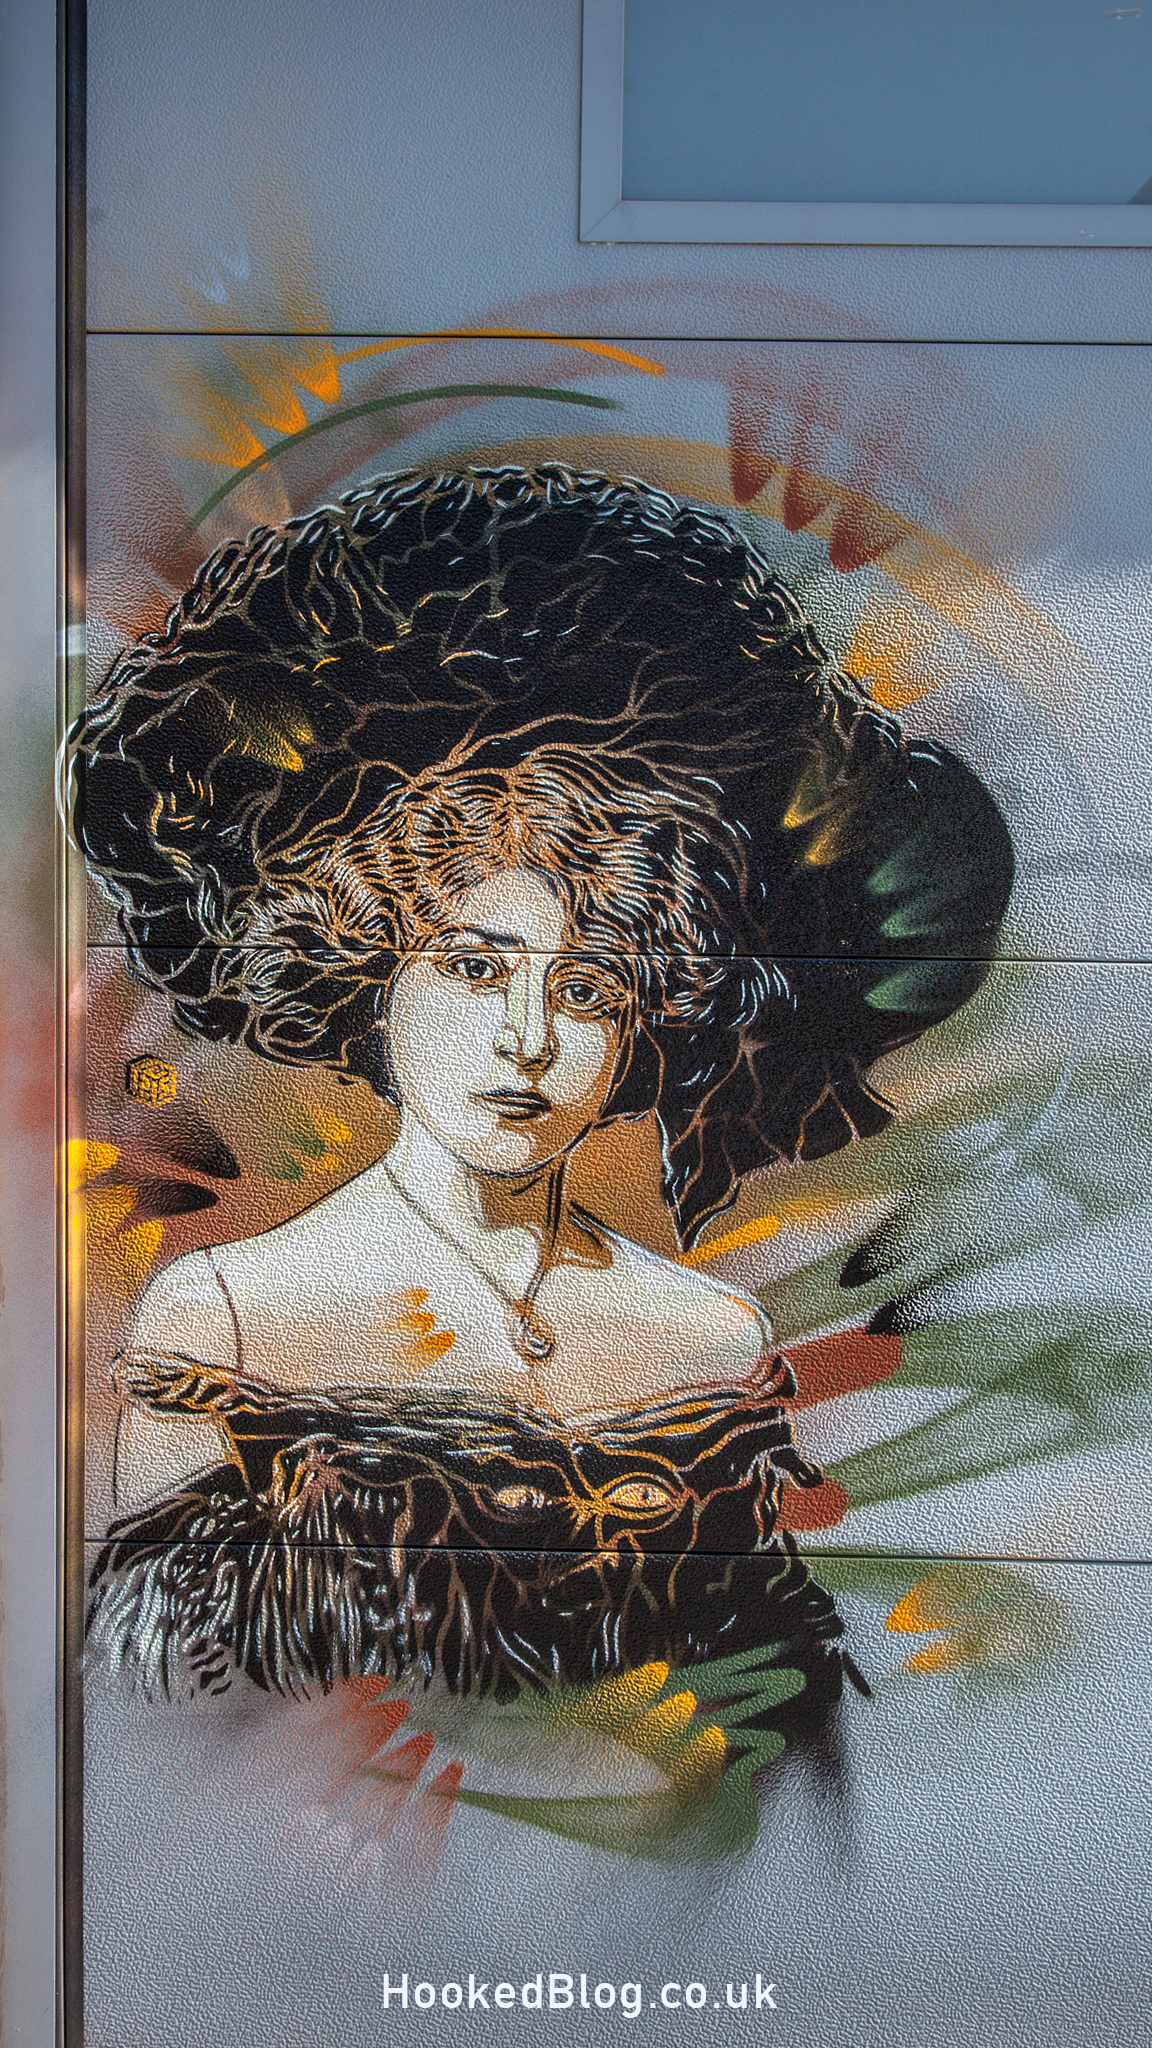 C215 Street Art For the Crystal Ship Festival in Ostend, Belgium